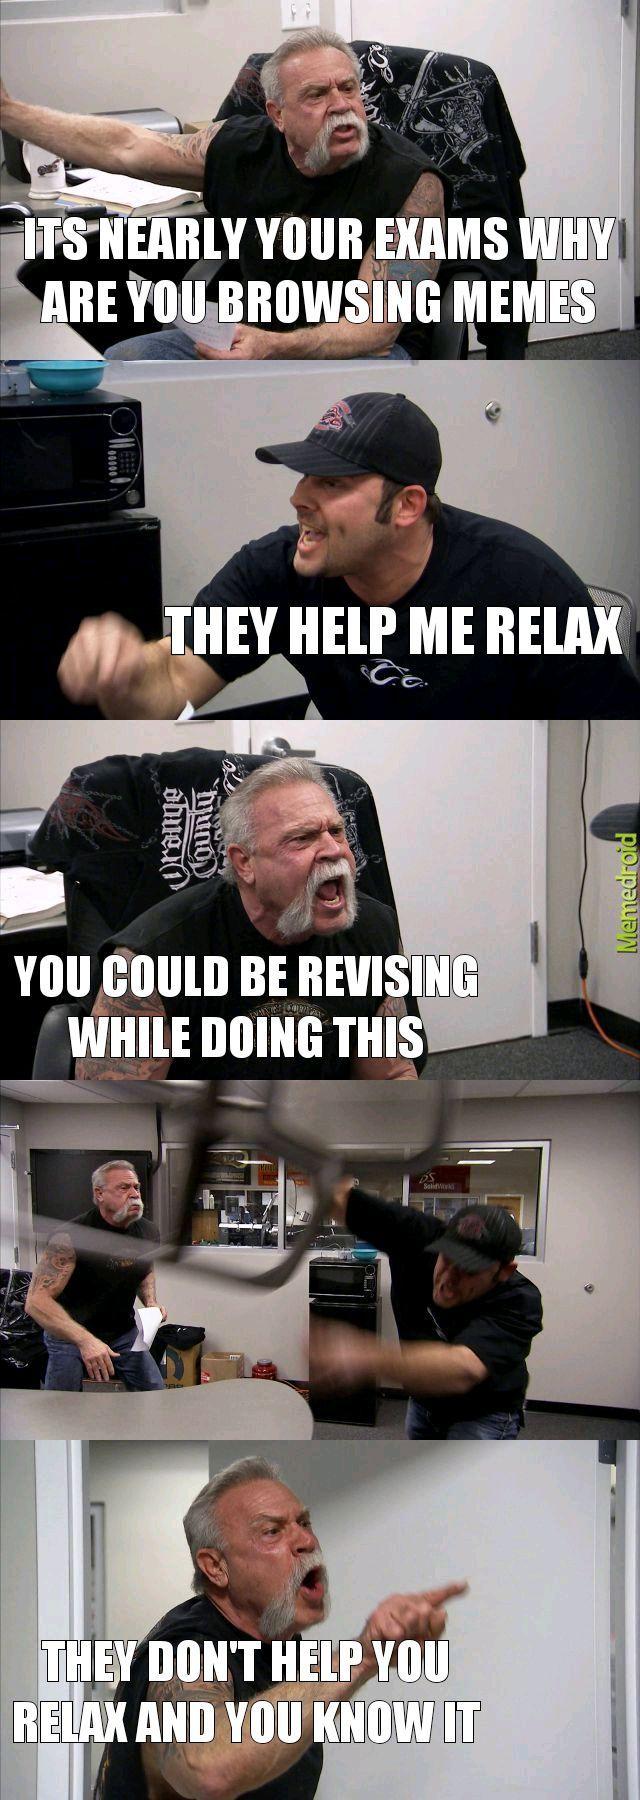 Overused formatt - meme